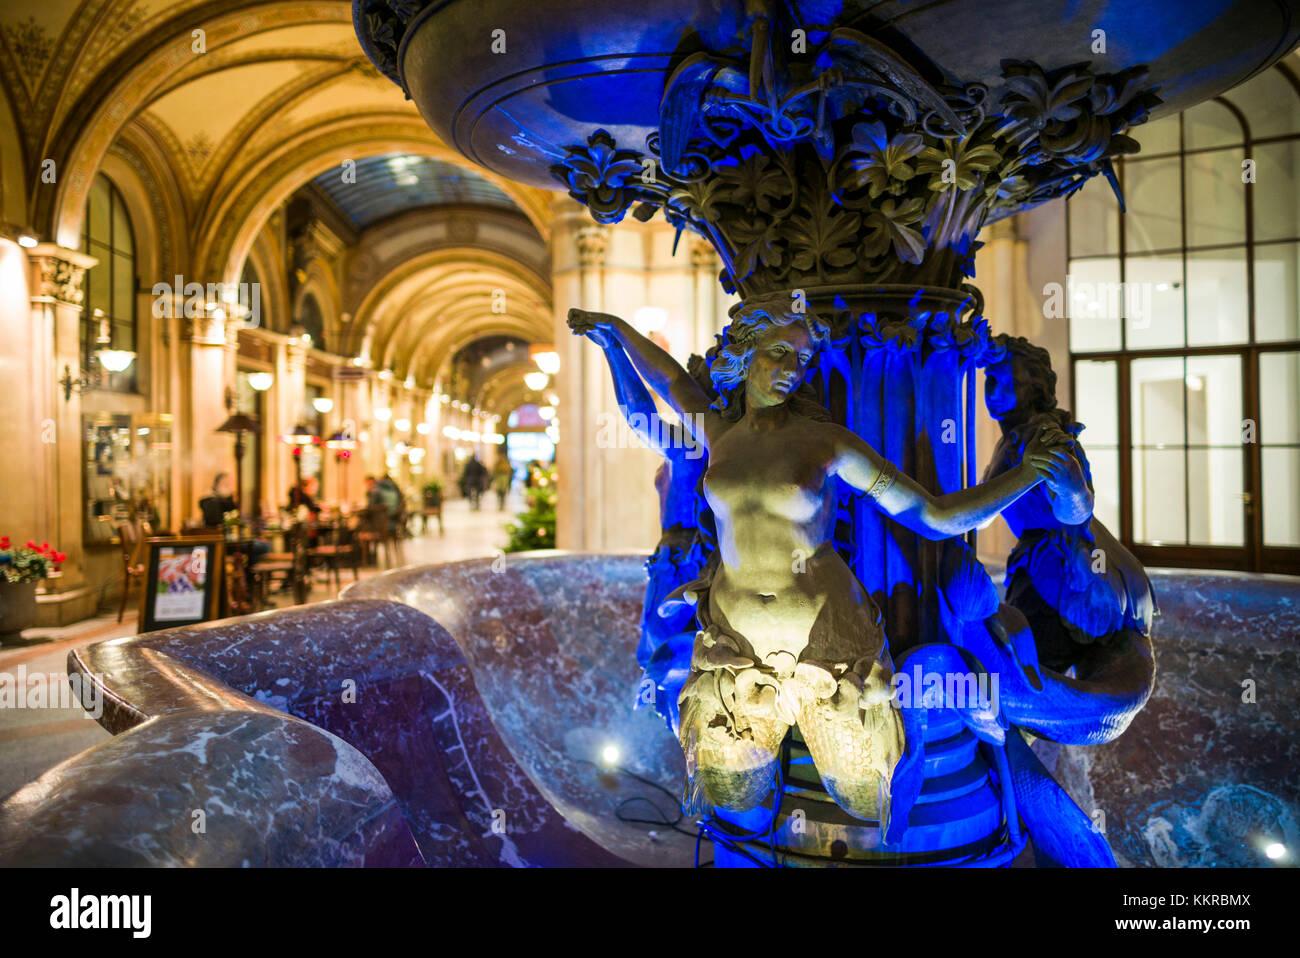 Austria, Vienna, Palais Ferstel shopping arcade, interior - Stock Image